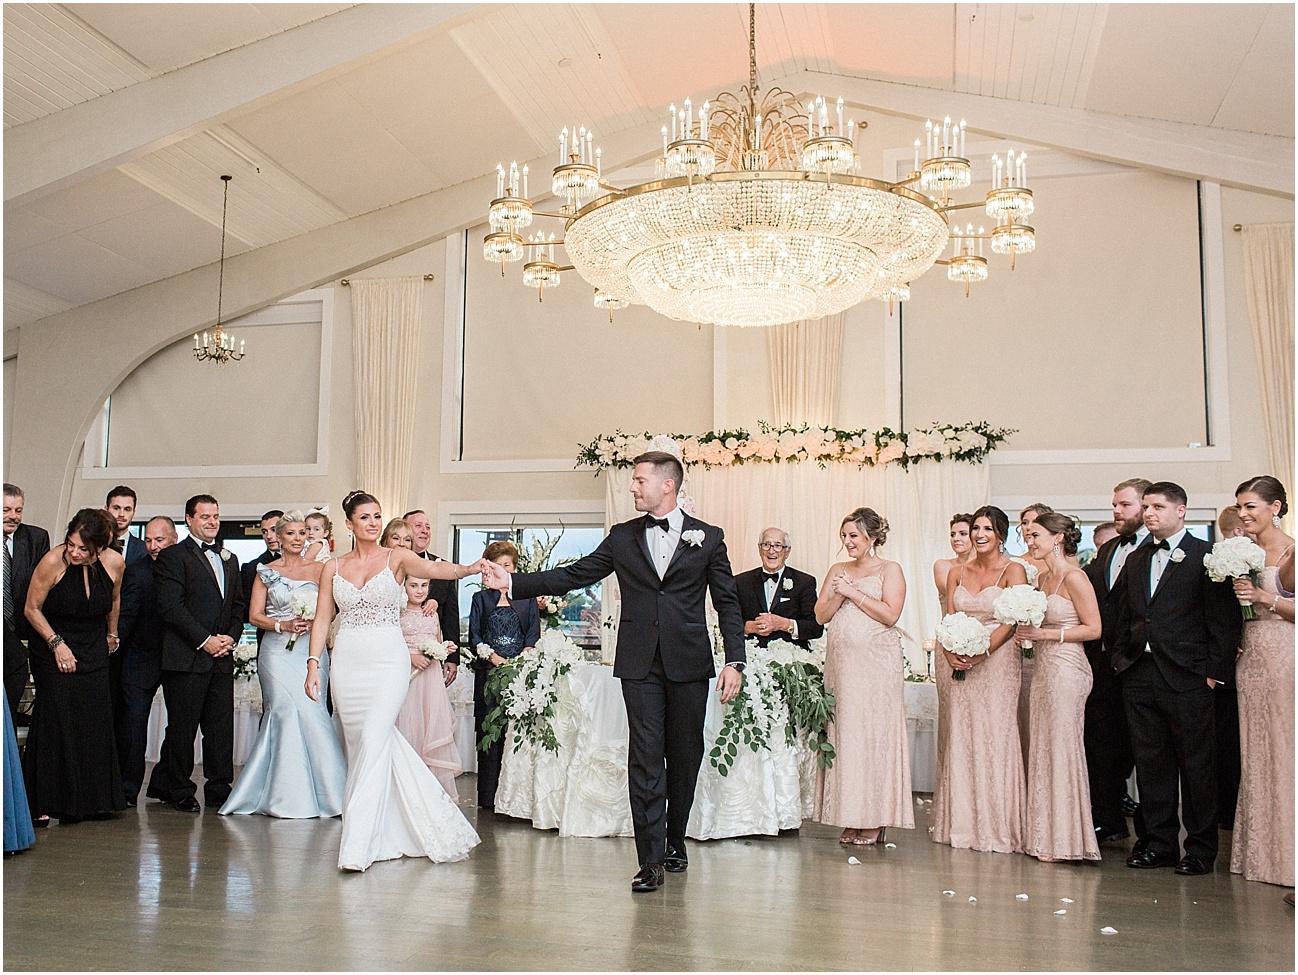 bianca_chris_danversport_italian_blush_gold_north_shore_cape_cod_boston_wedding_photographer_meredith_jane_photography_photo_1151.jpg